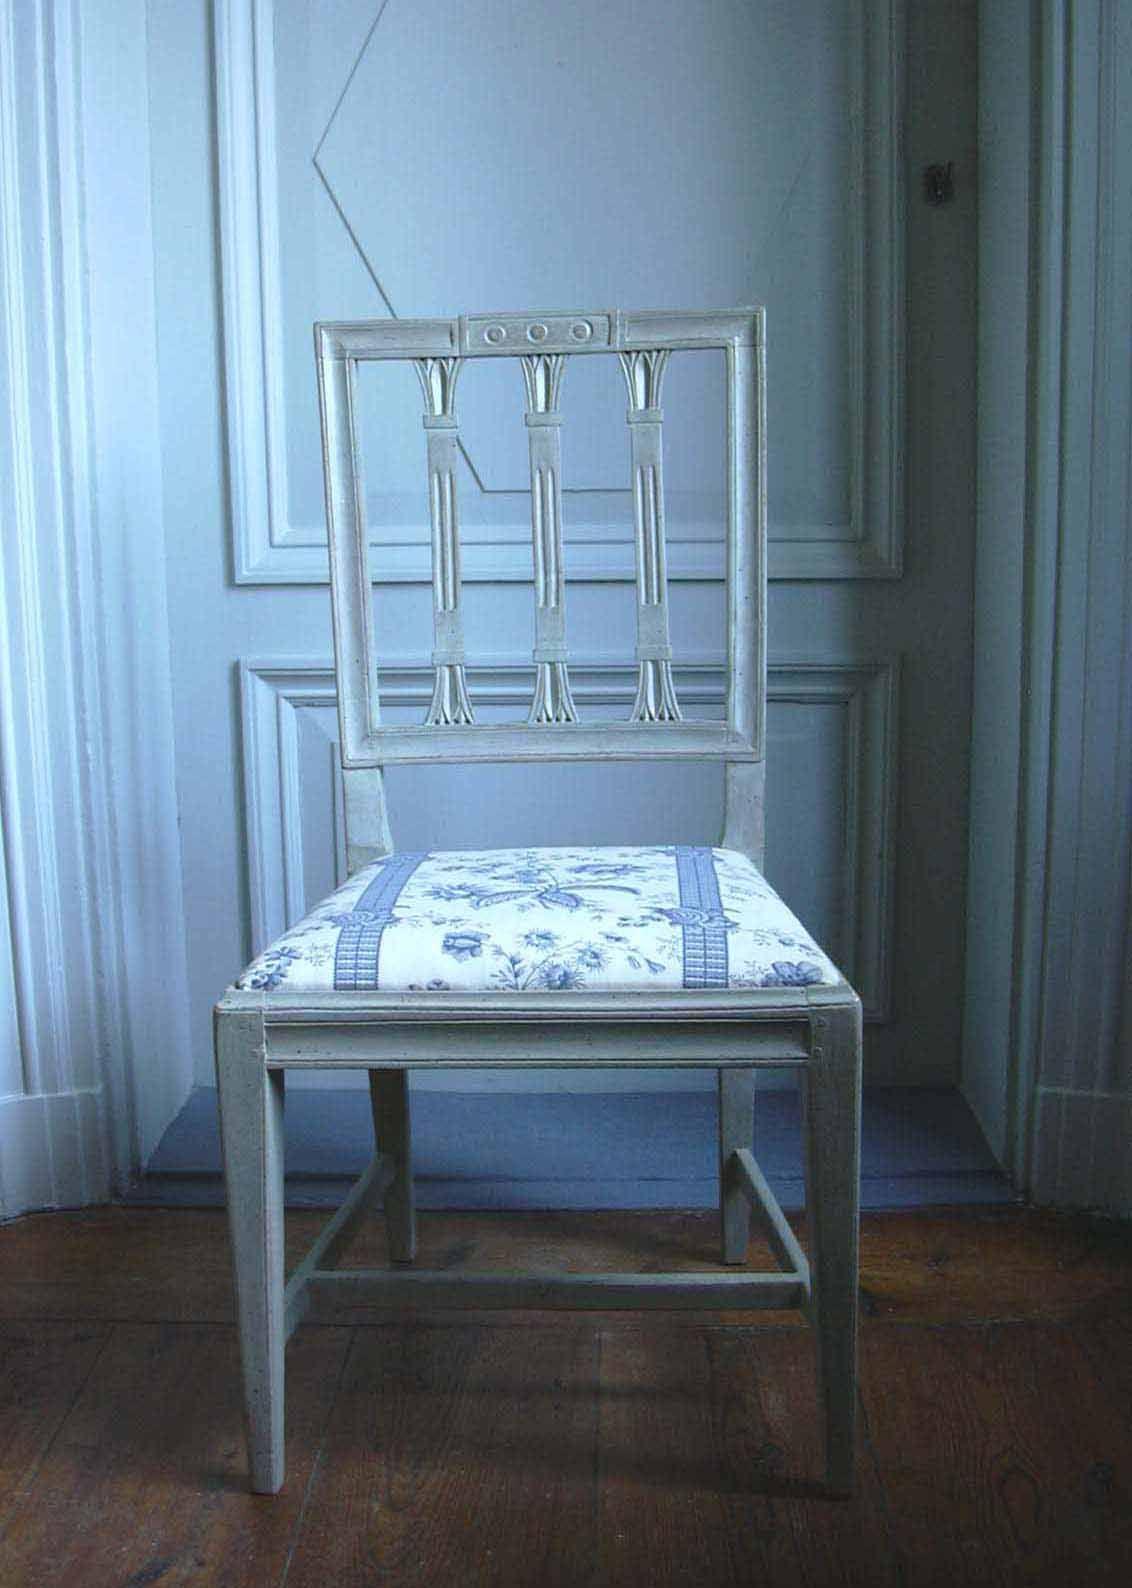 Gustavian chair, Tone on Tone